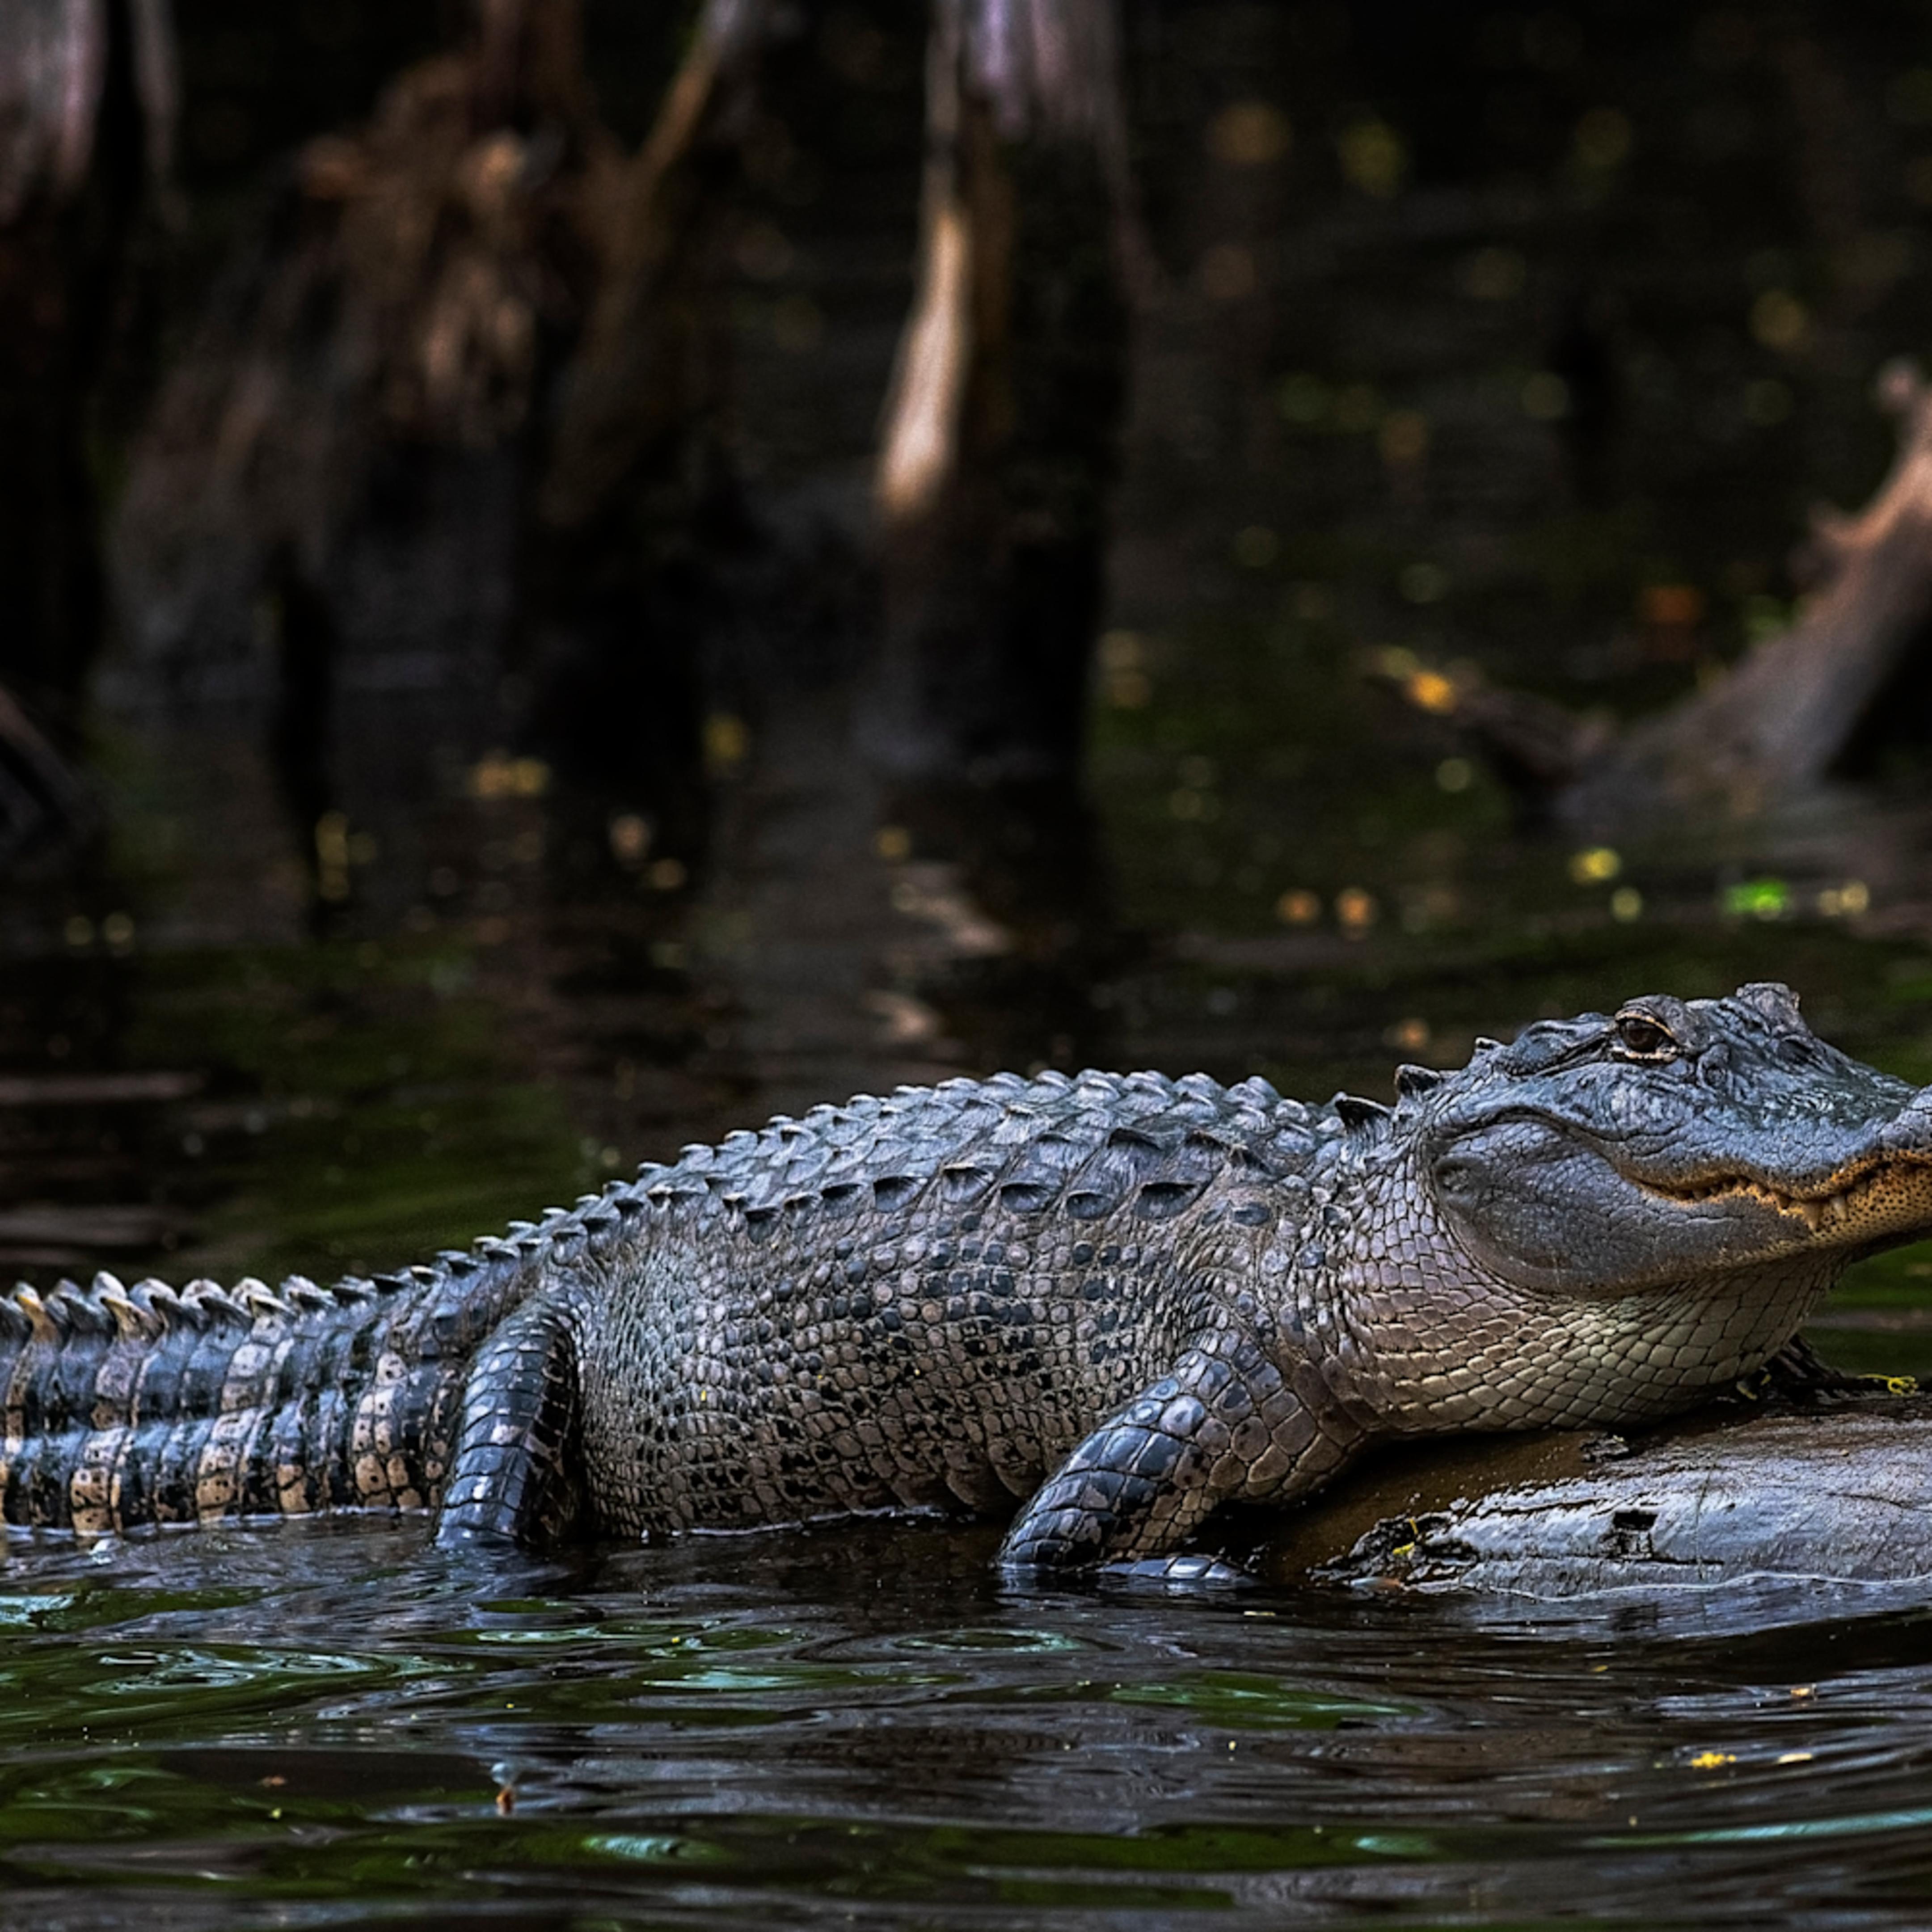 Andy crawford photography sunning alligator l6yr7h